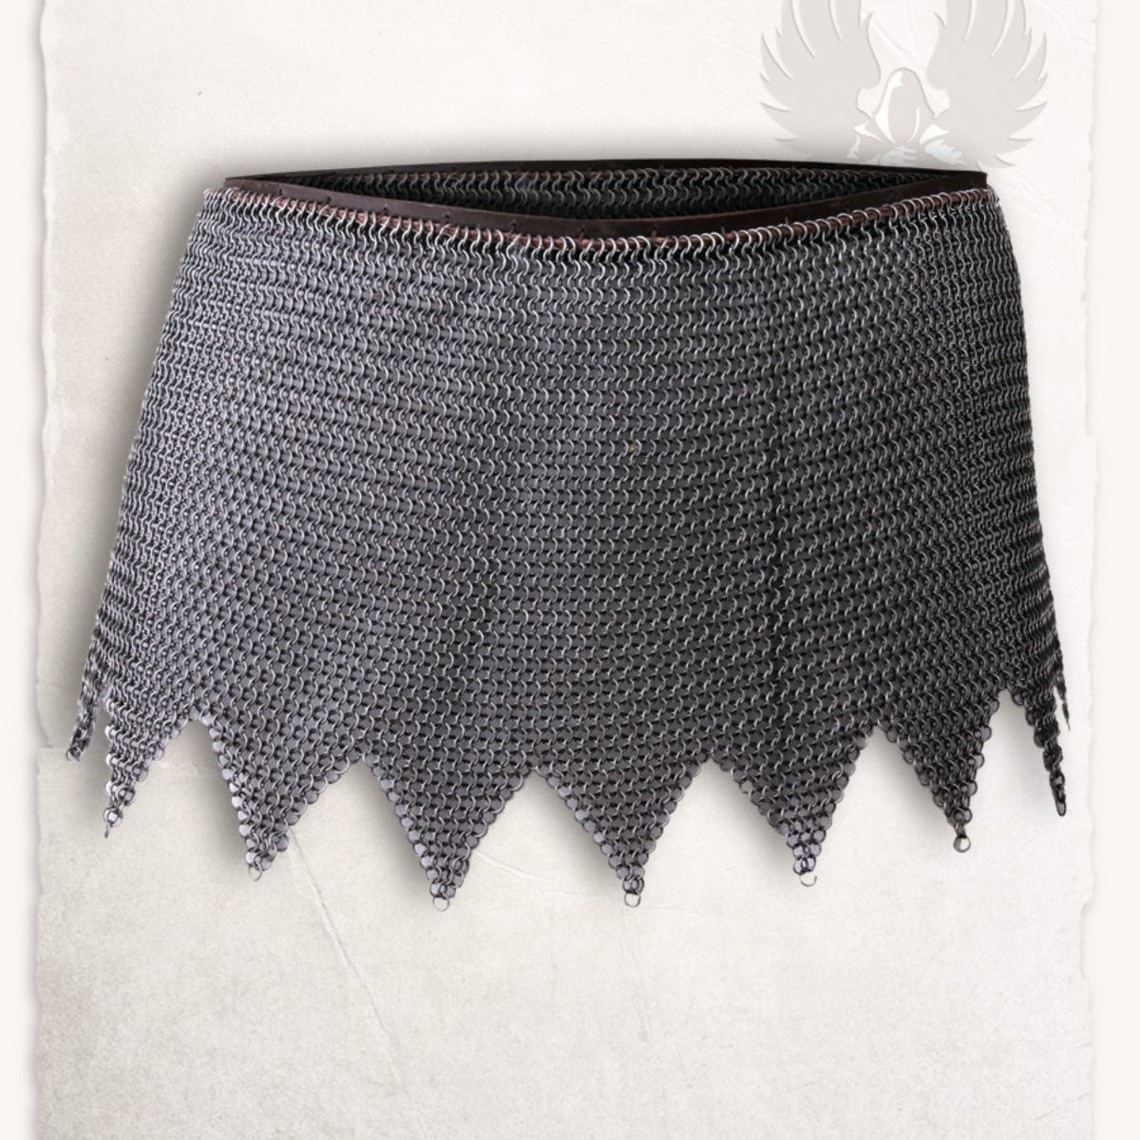 Mytholon Chainmail skirt Richard, mild steel, butted